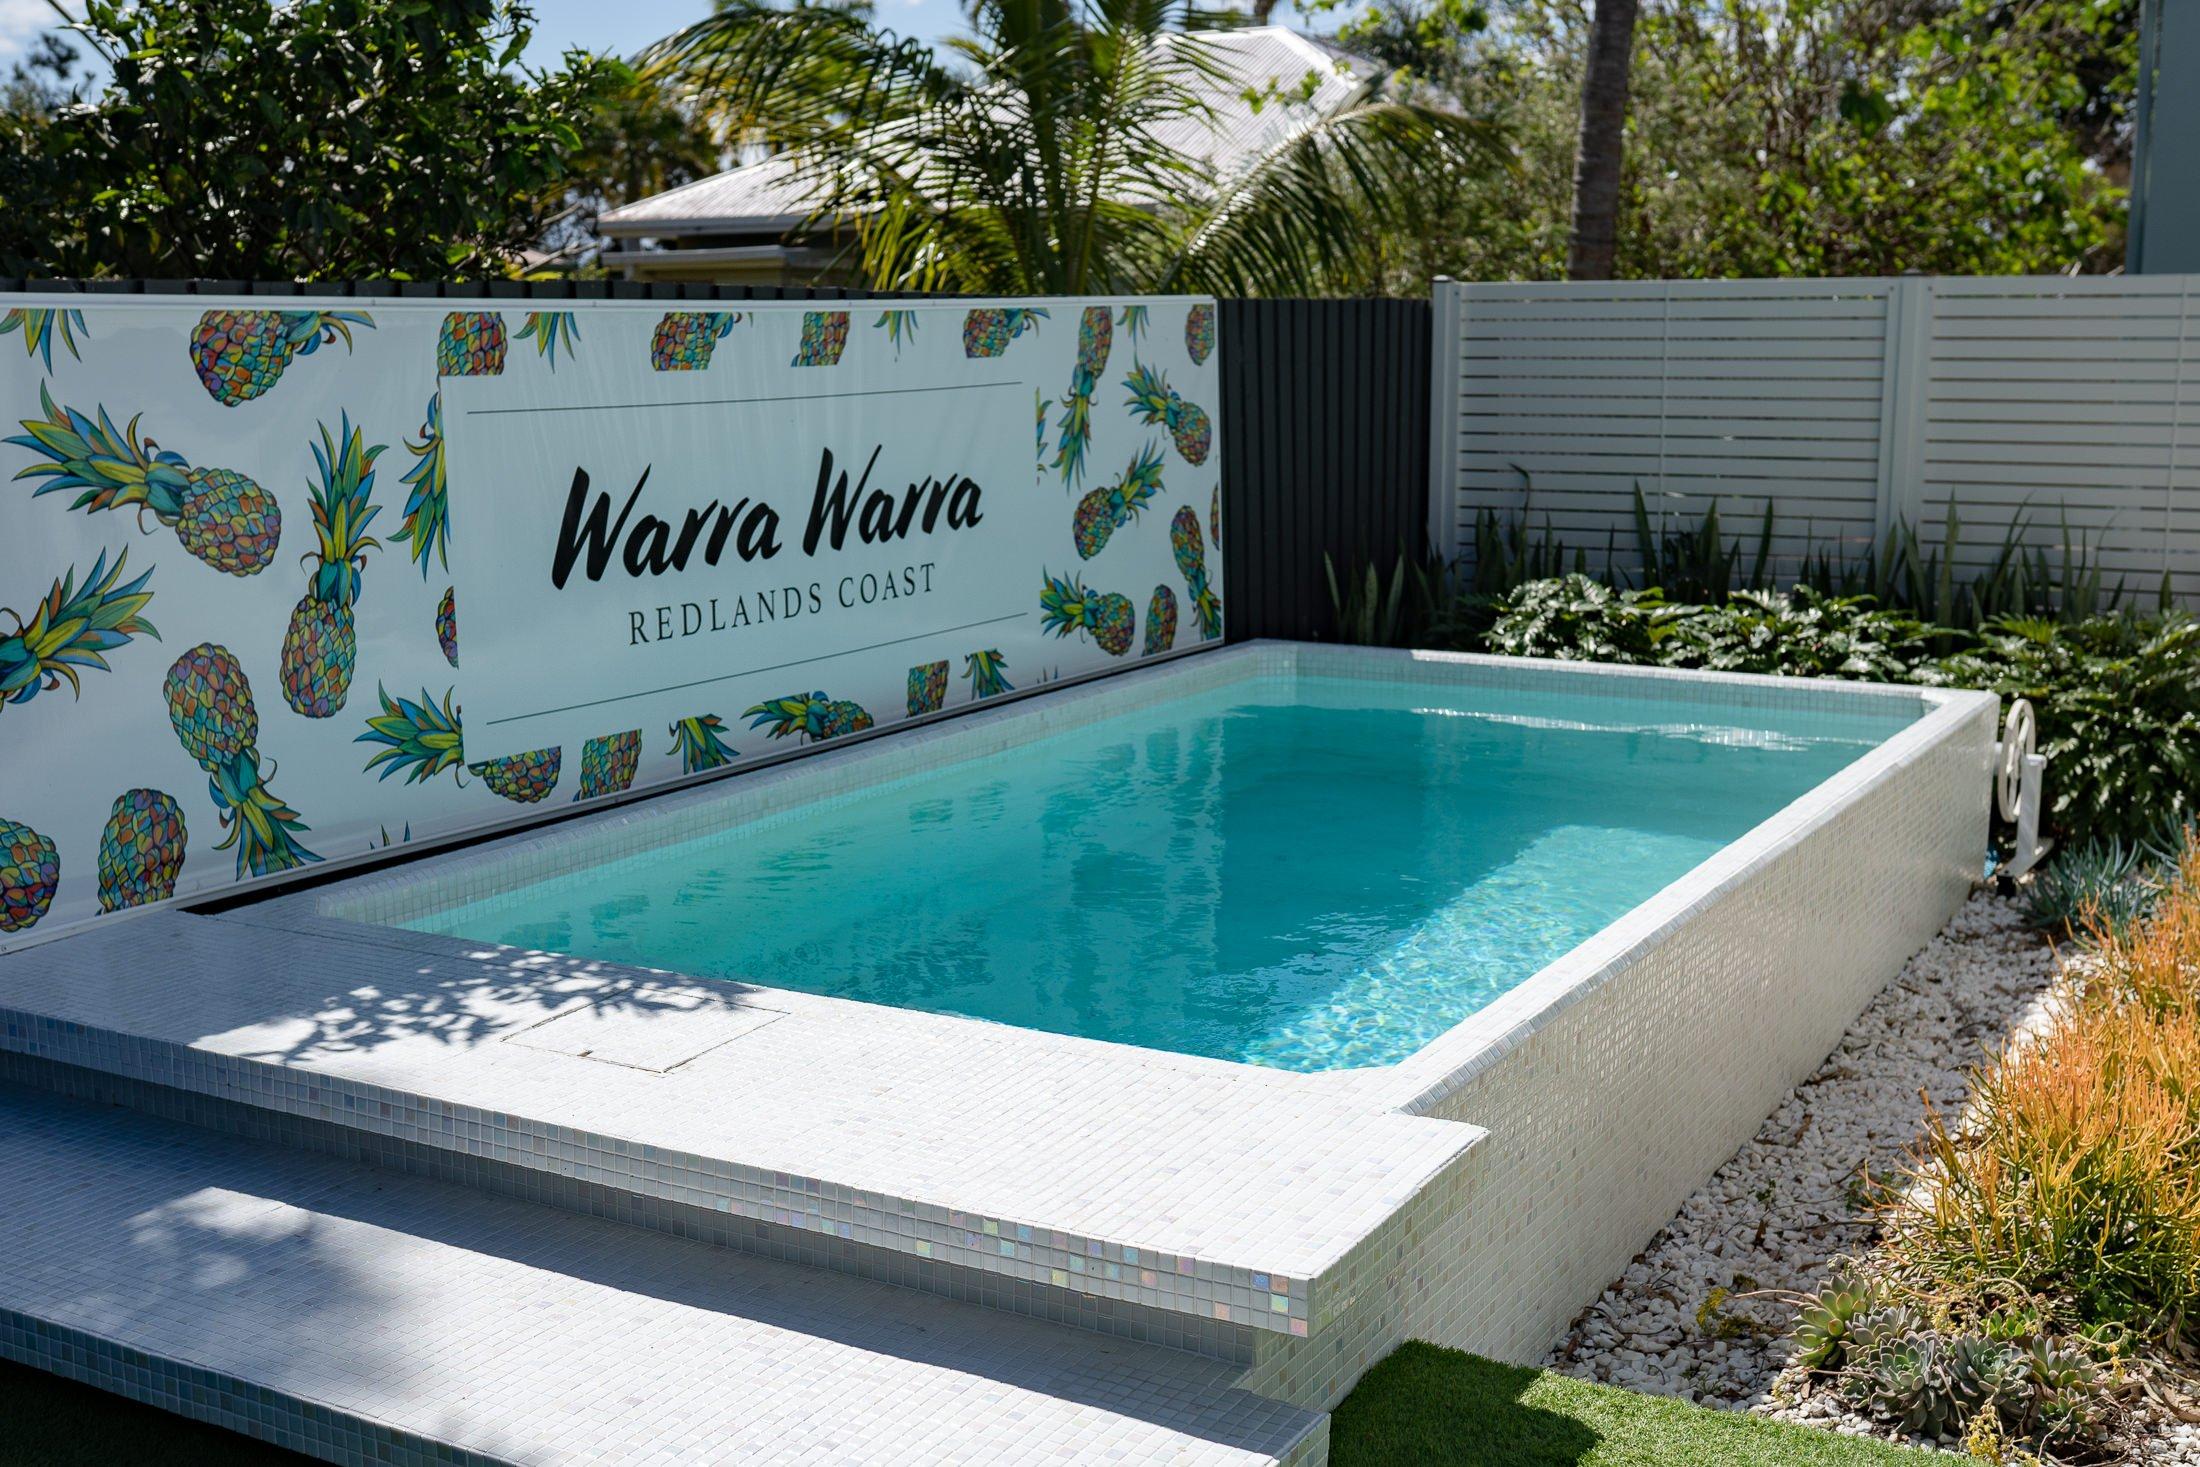 Plungie Original 15ft x 8ft pool in Kona Coast